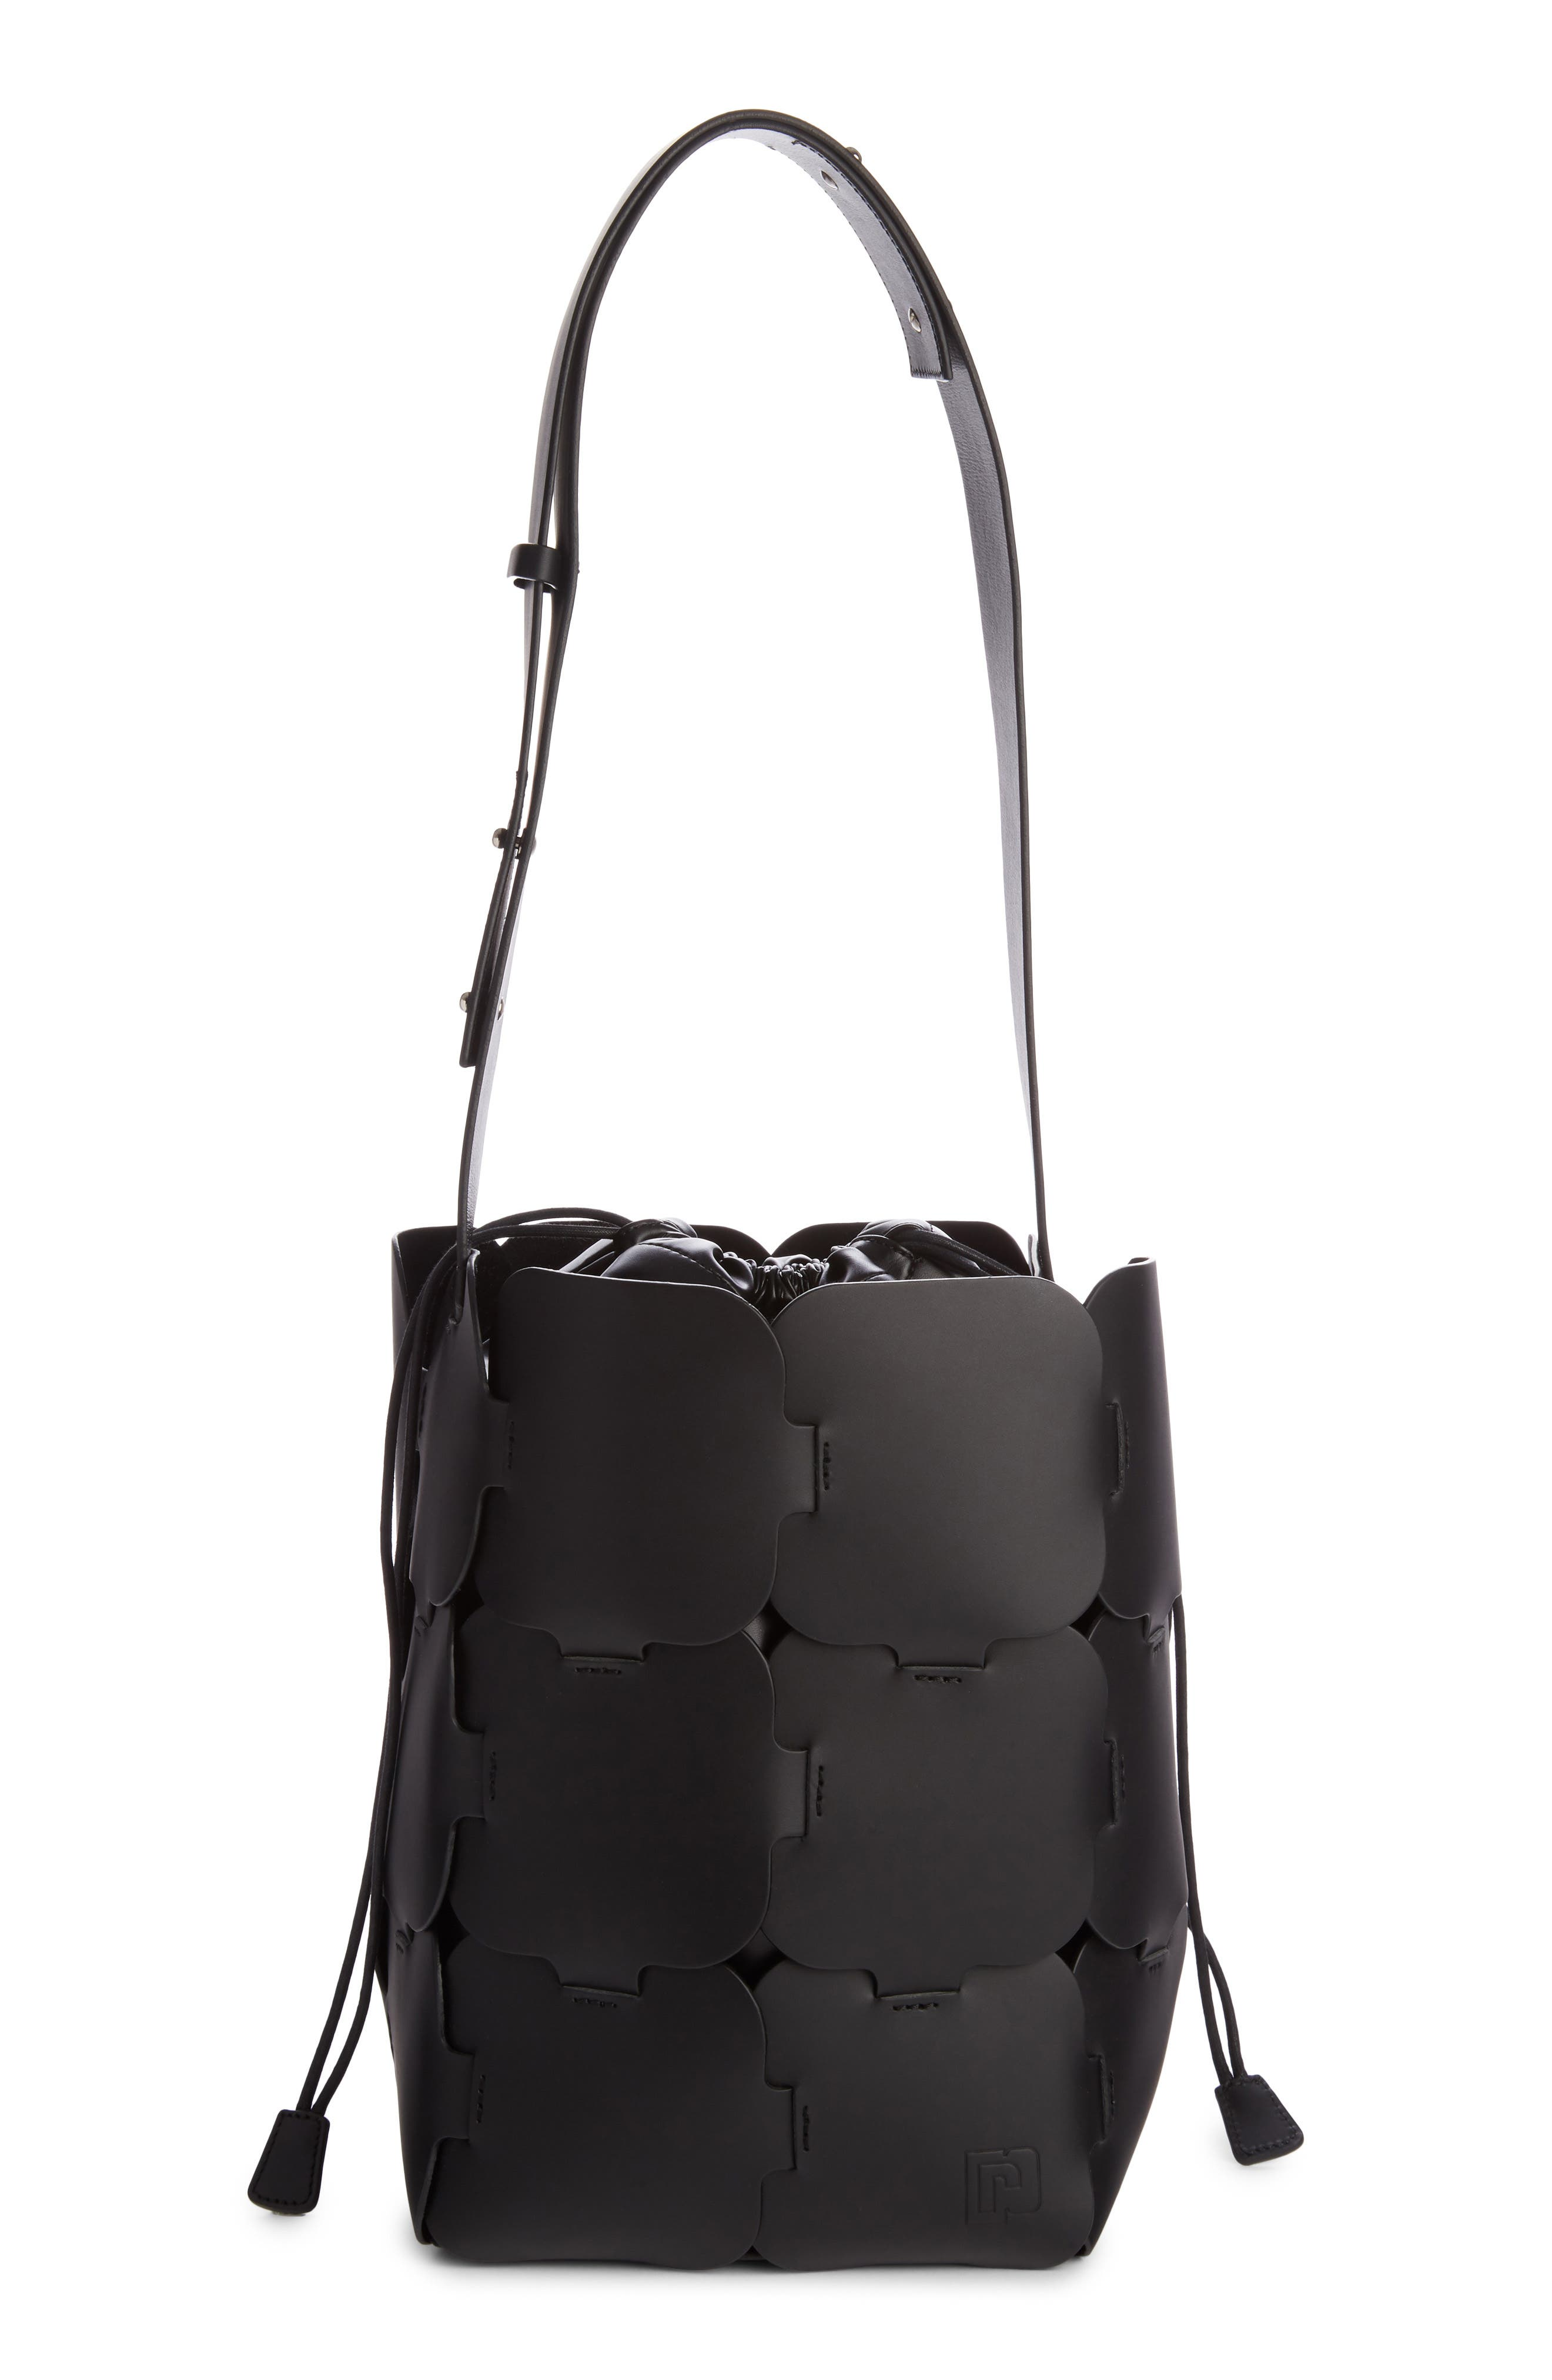 paco rabanne Medium Element Leather Bucket Bag